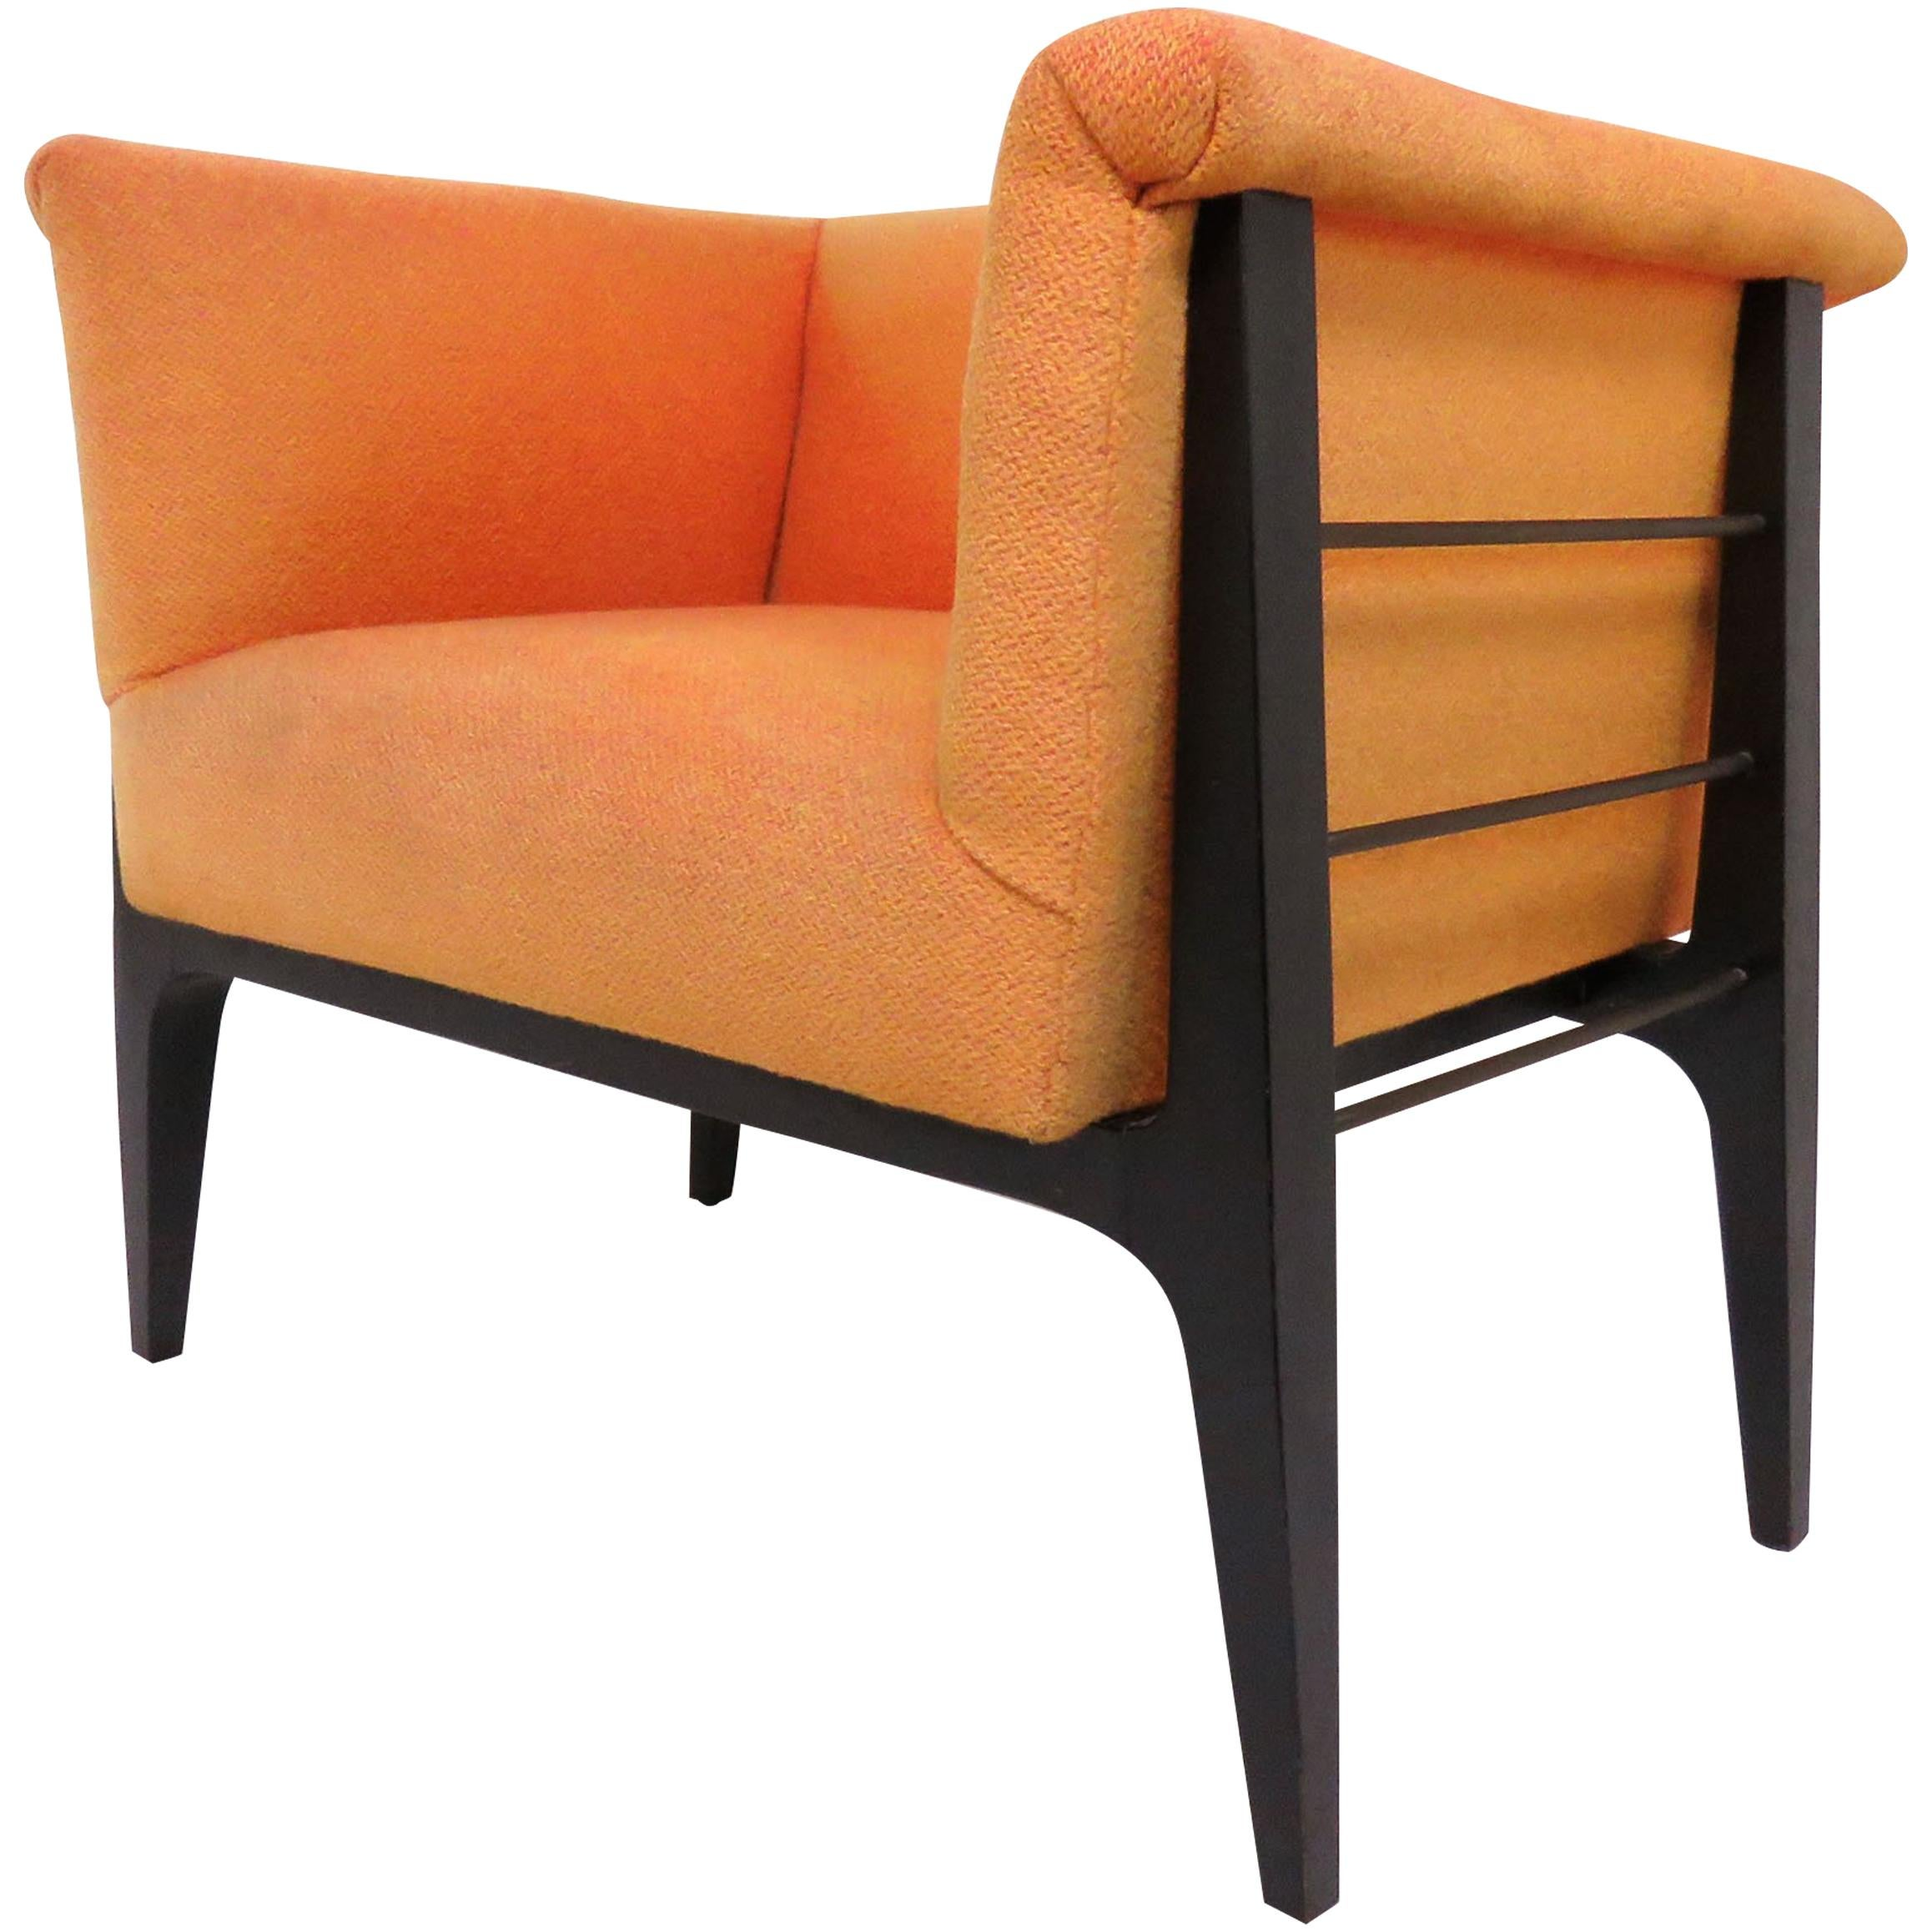 Mid-Century Modern Armchair in Manner of Harvey Probber